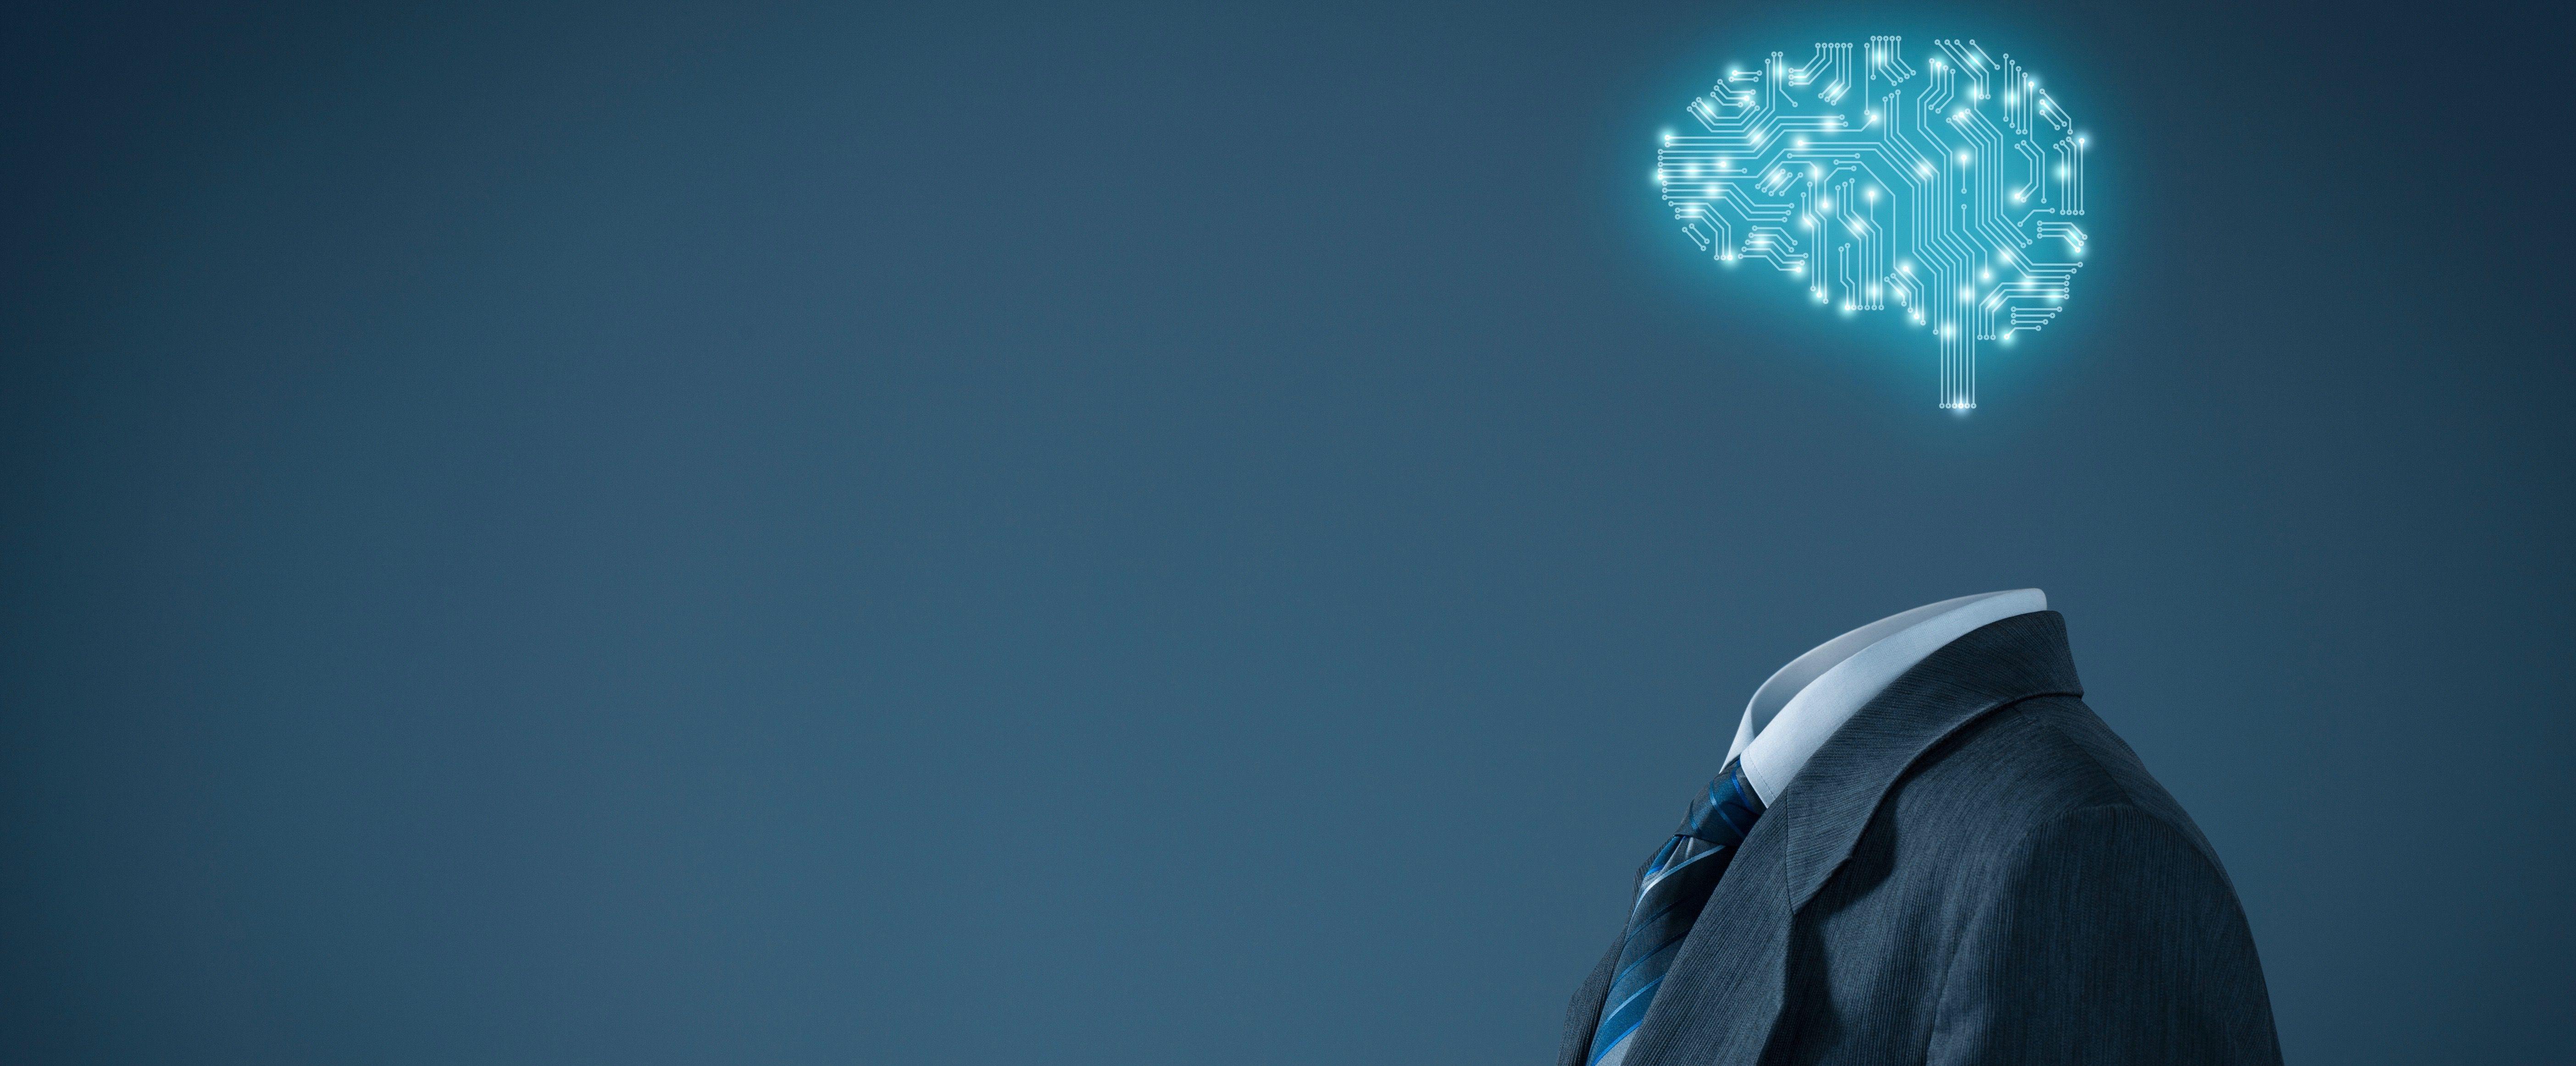 AI-Startups-compressor.jpg  6 AI Startups We're Keeping an Eye On AI Startups compressor